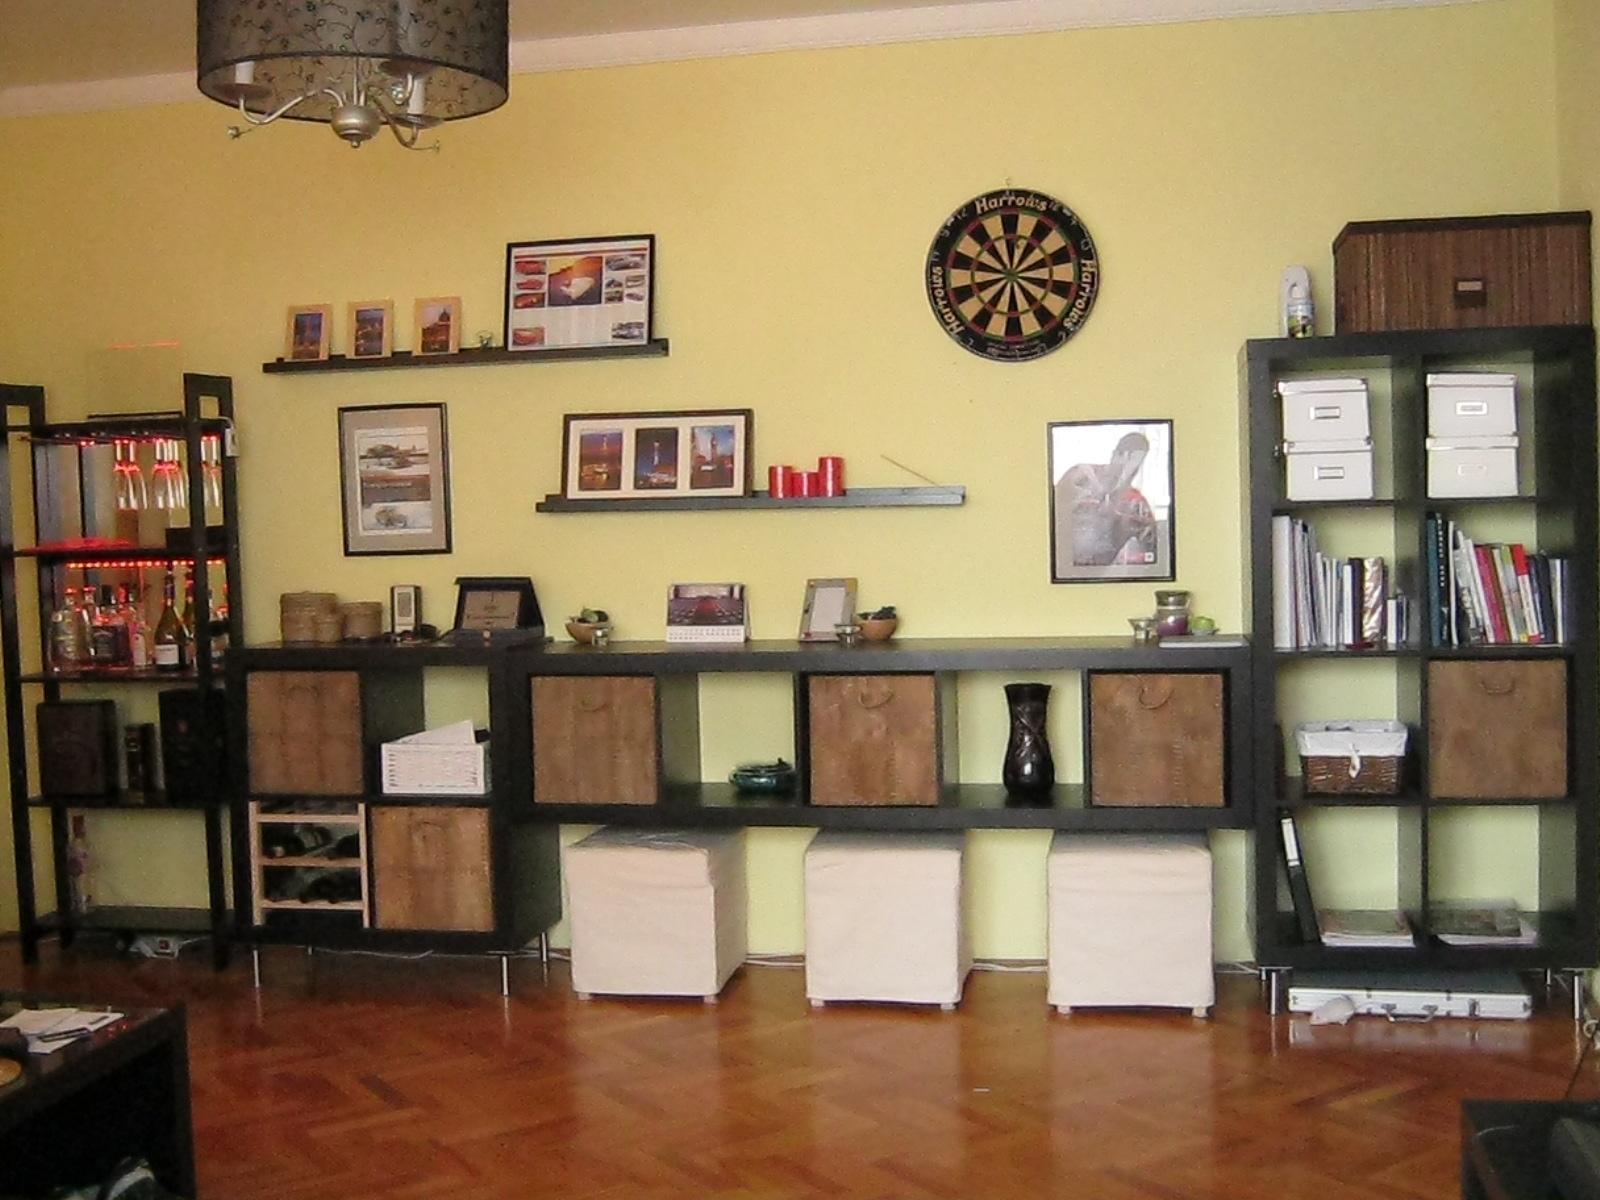 The Bachelors Living Room